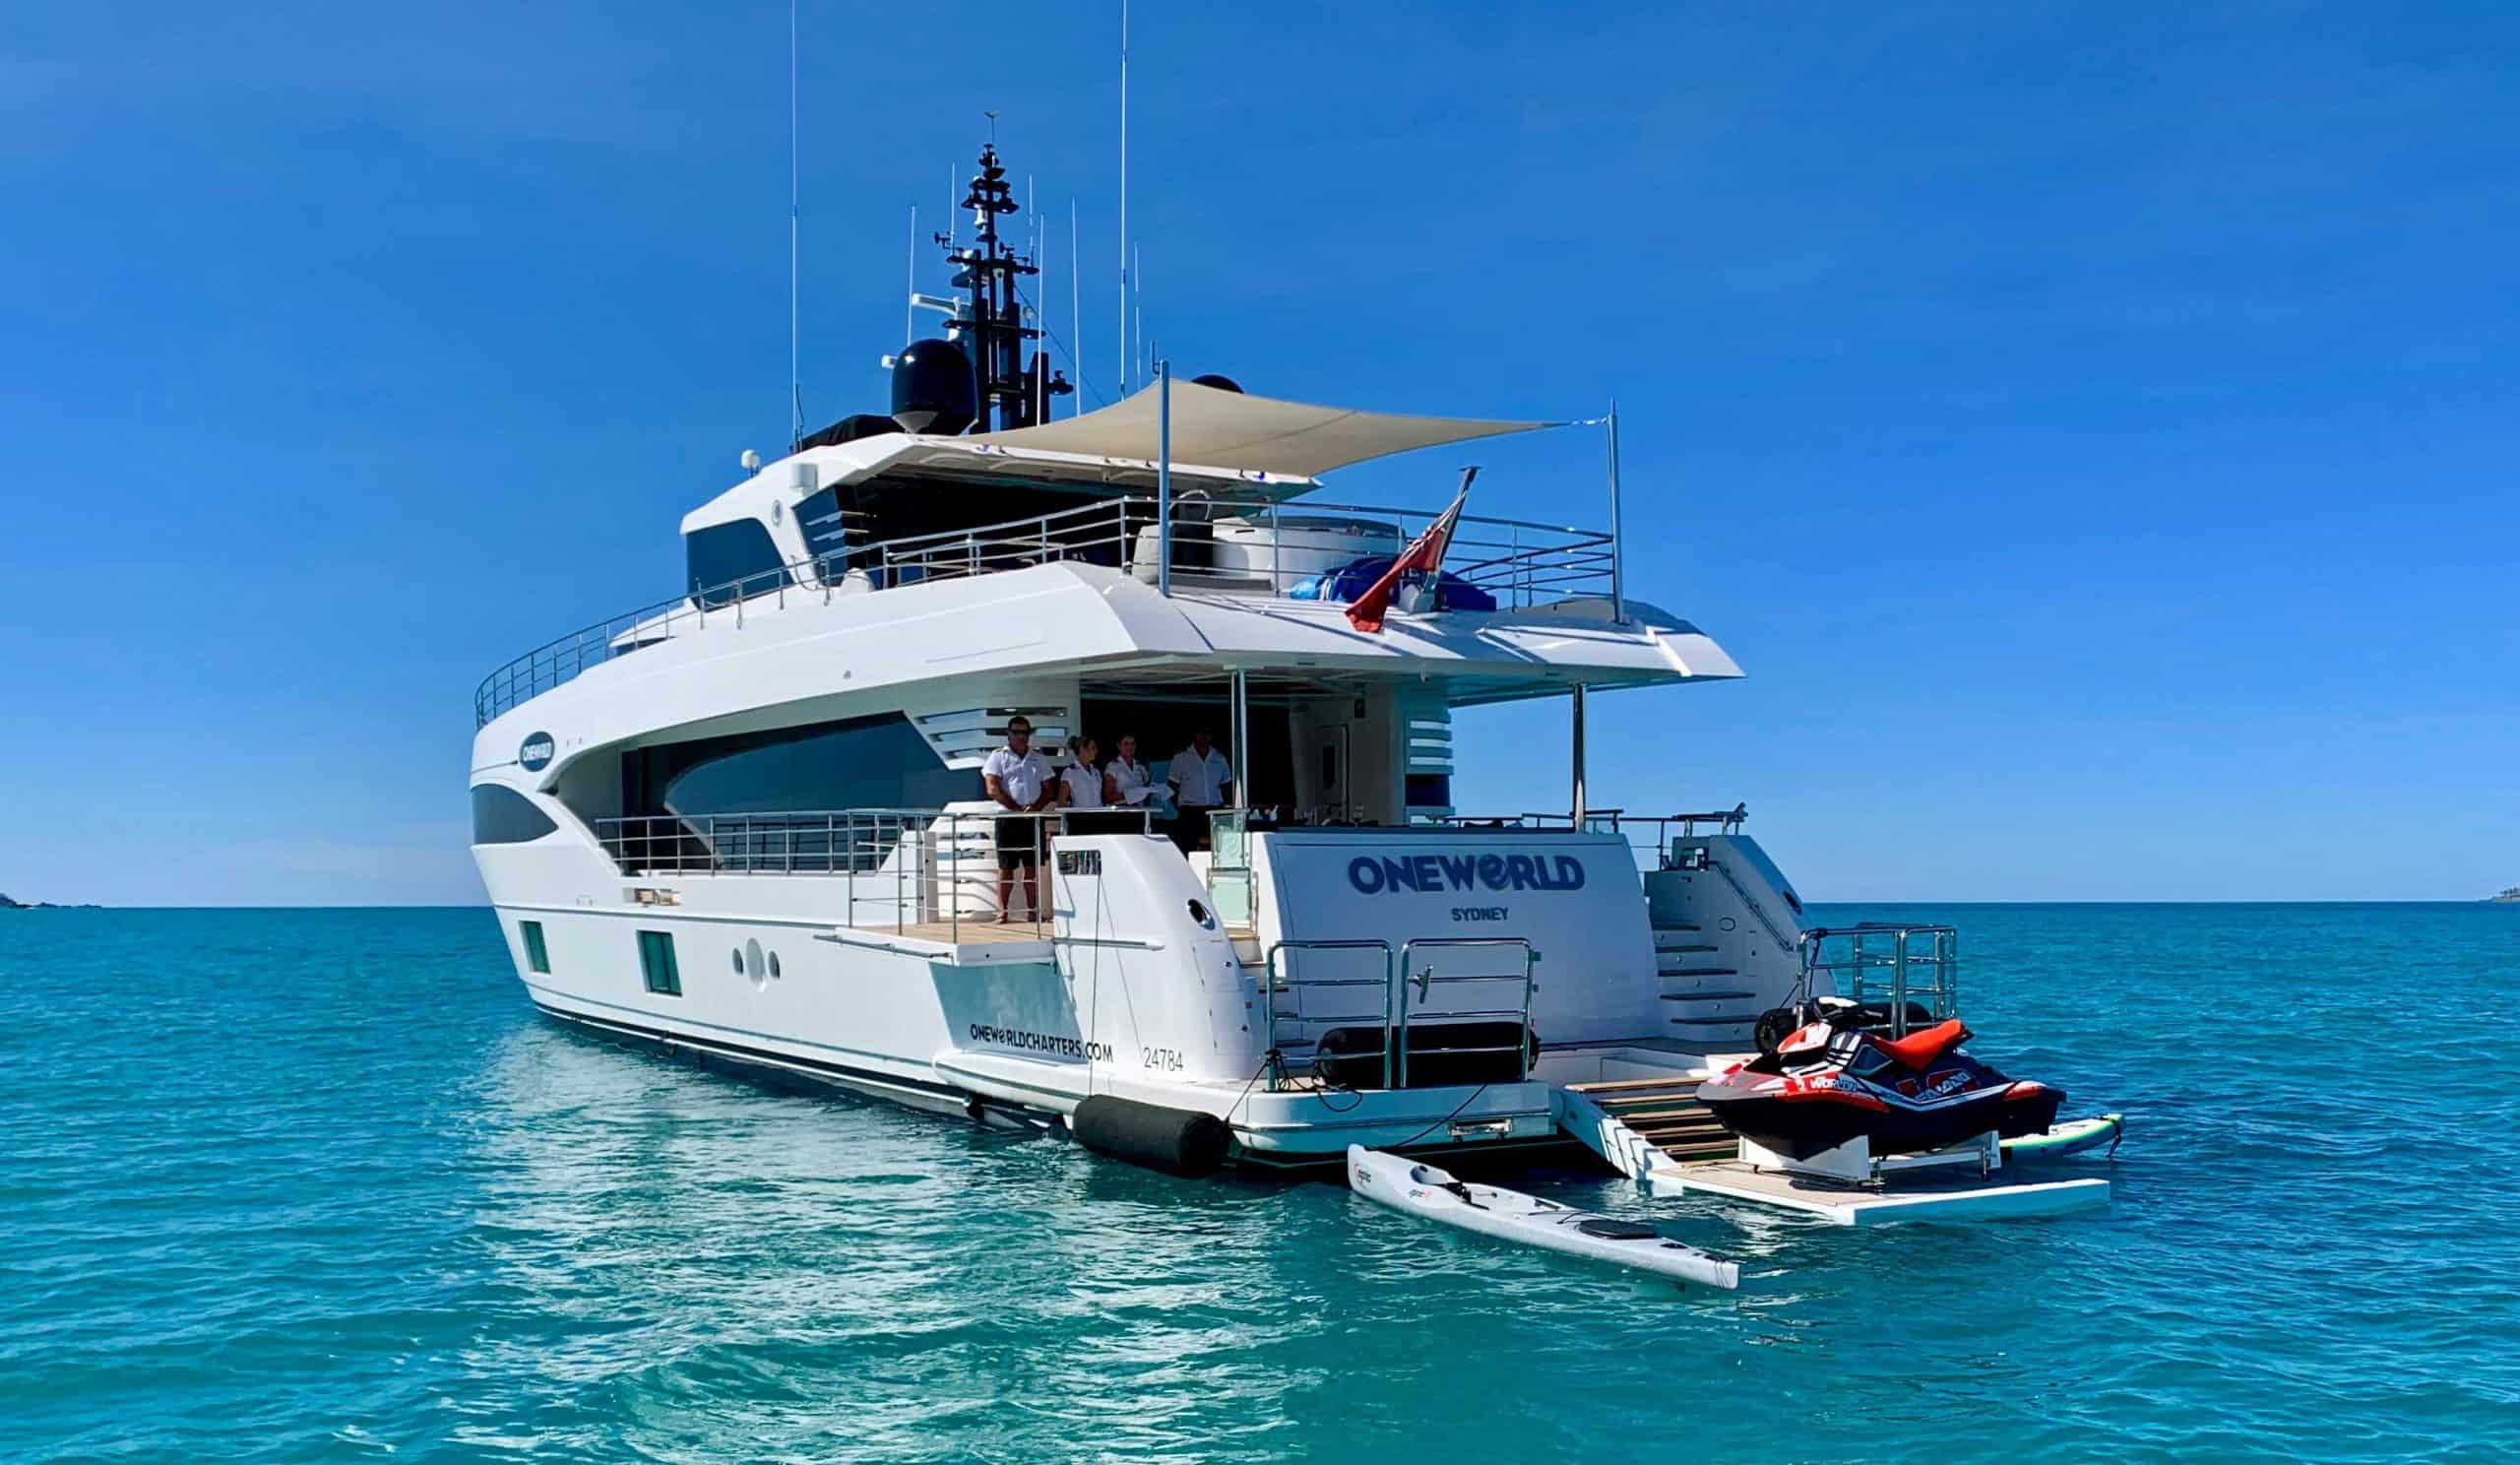 oneworld yacht charter hamiltonm island